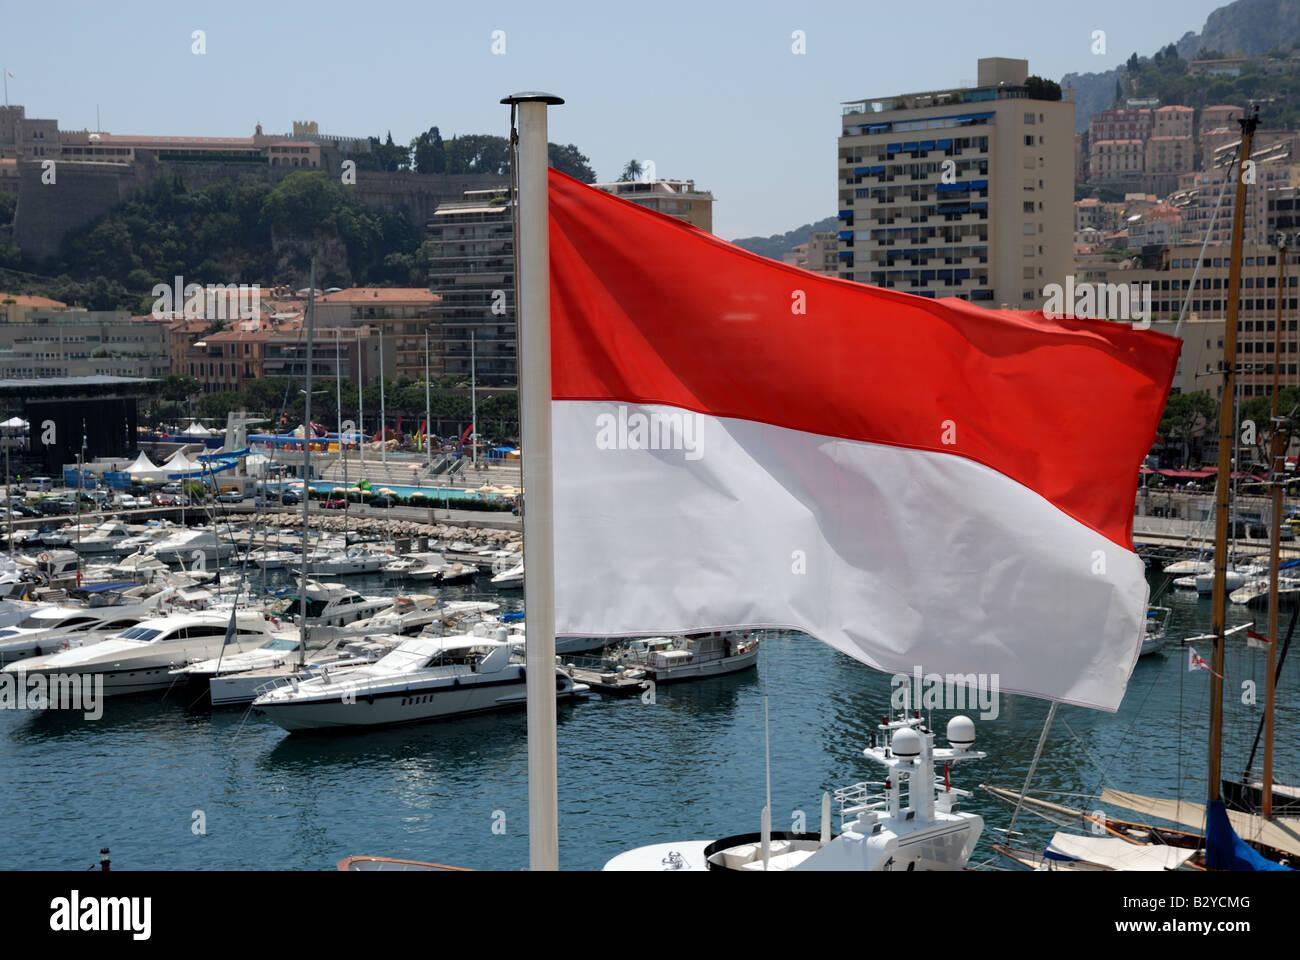 National flag of of the Principality of Monaco - Stock Image